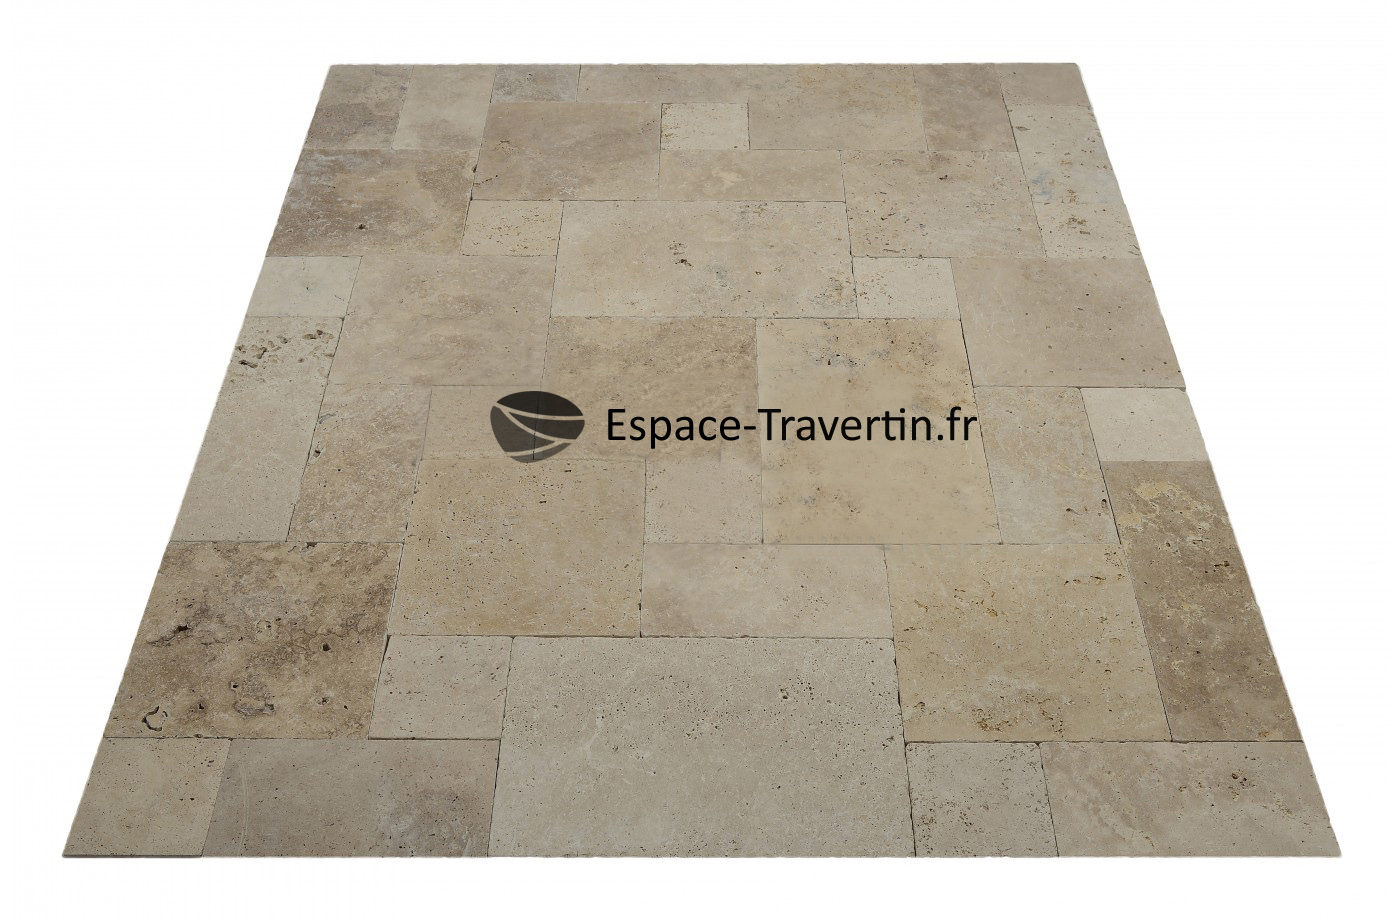 travertin opus 4 mix beige vieilli rustique sign espace travertin. Black Bedroom Furniture Sets. Home Design Ideas